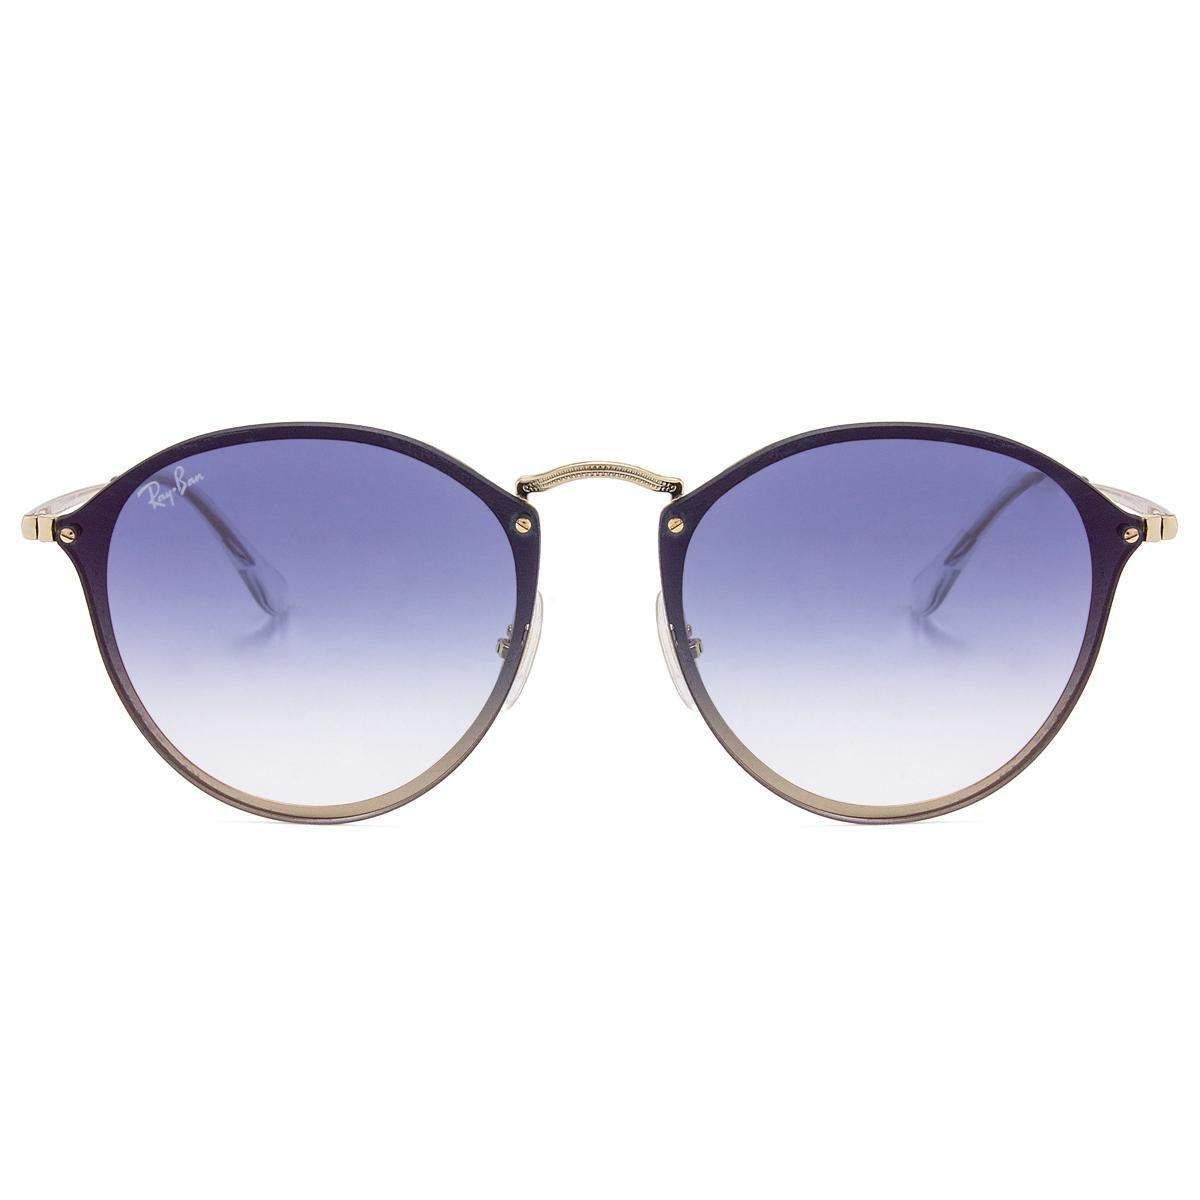 c9a815fde11dd Óculos de Sol Ray-Ban Blaze Round RB3574N -001 X0 59 - Compre Agora ...